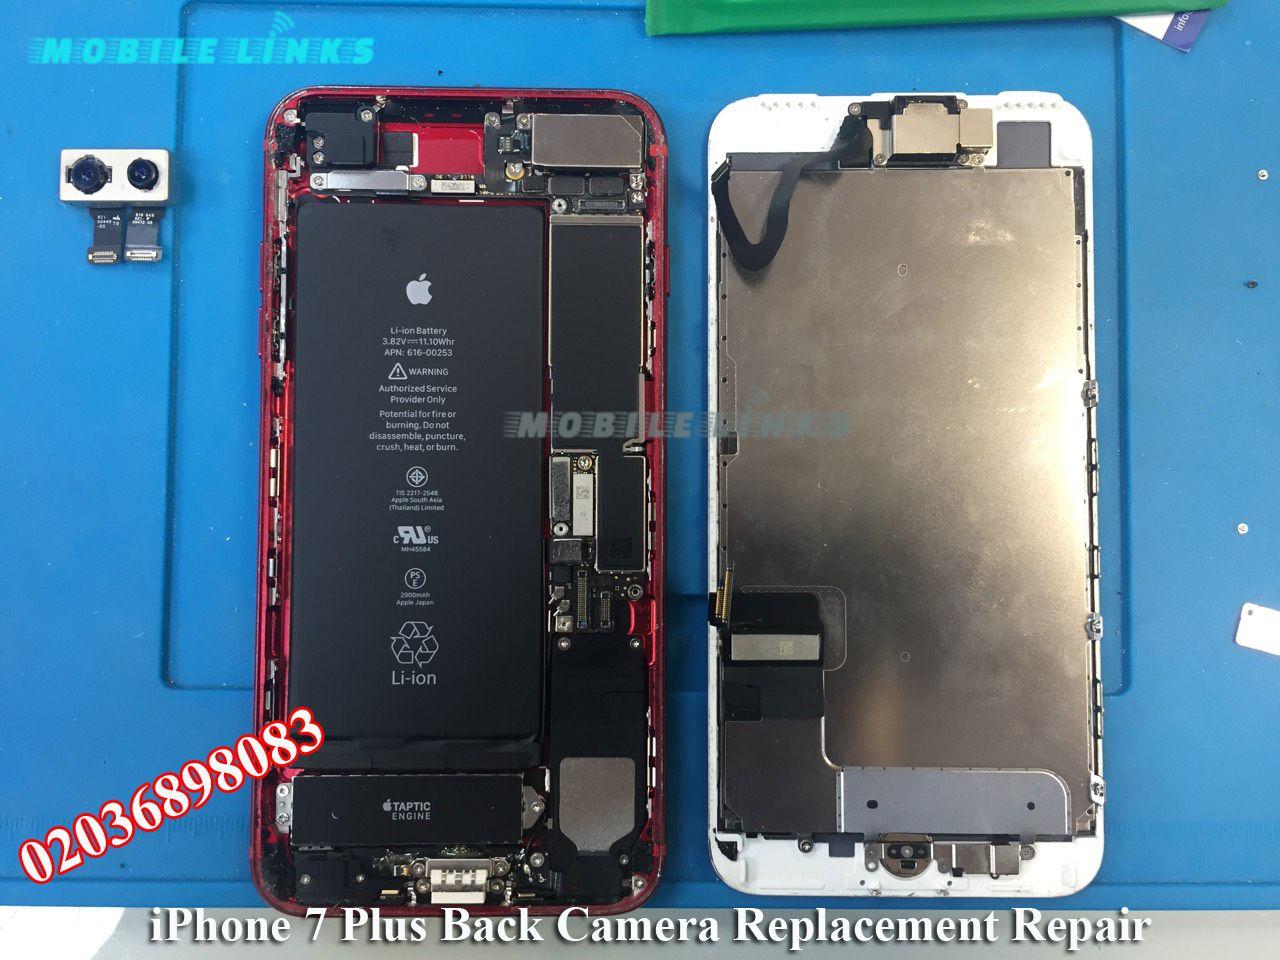 Iphone 7 Plus Back Camera Replacement Repair Iphone 7 Plus Iphone 7 Iphone